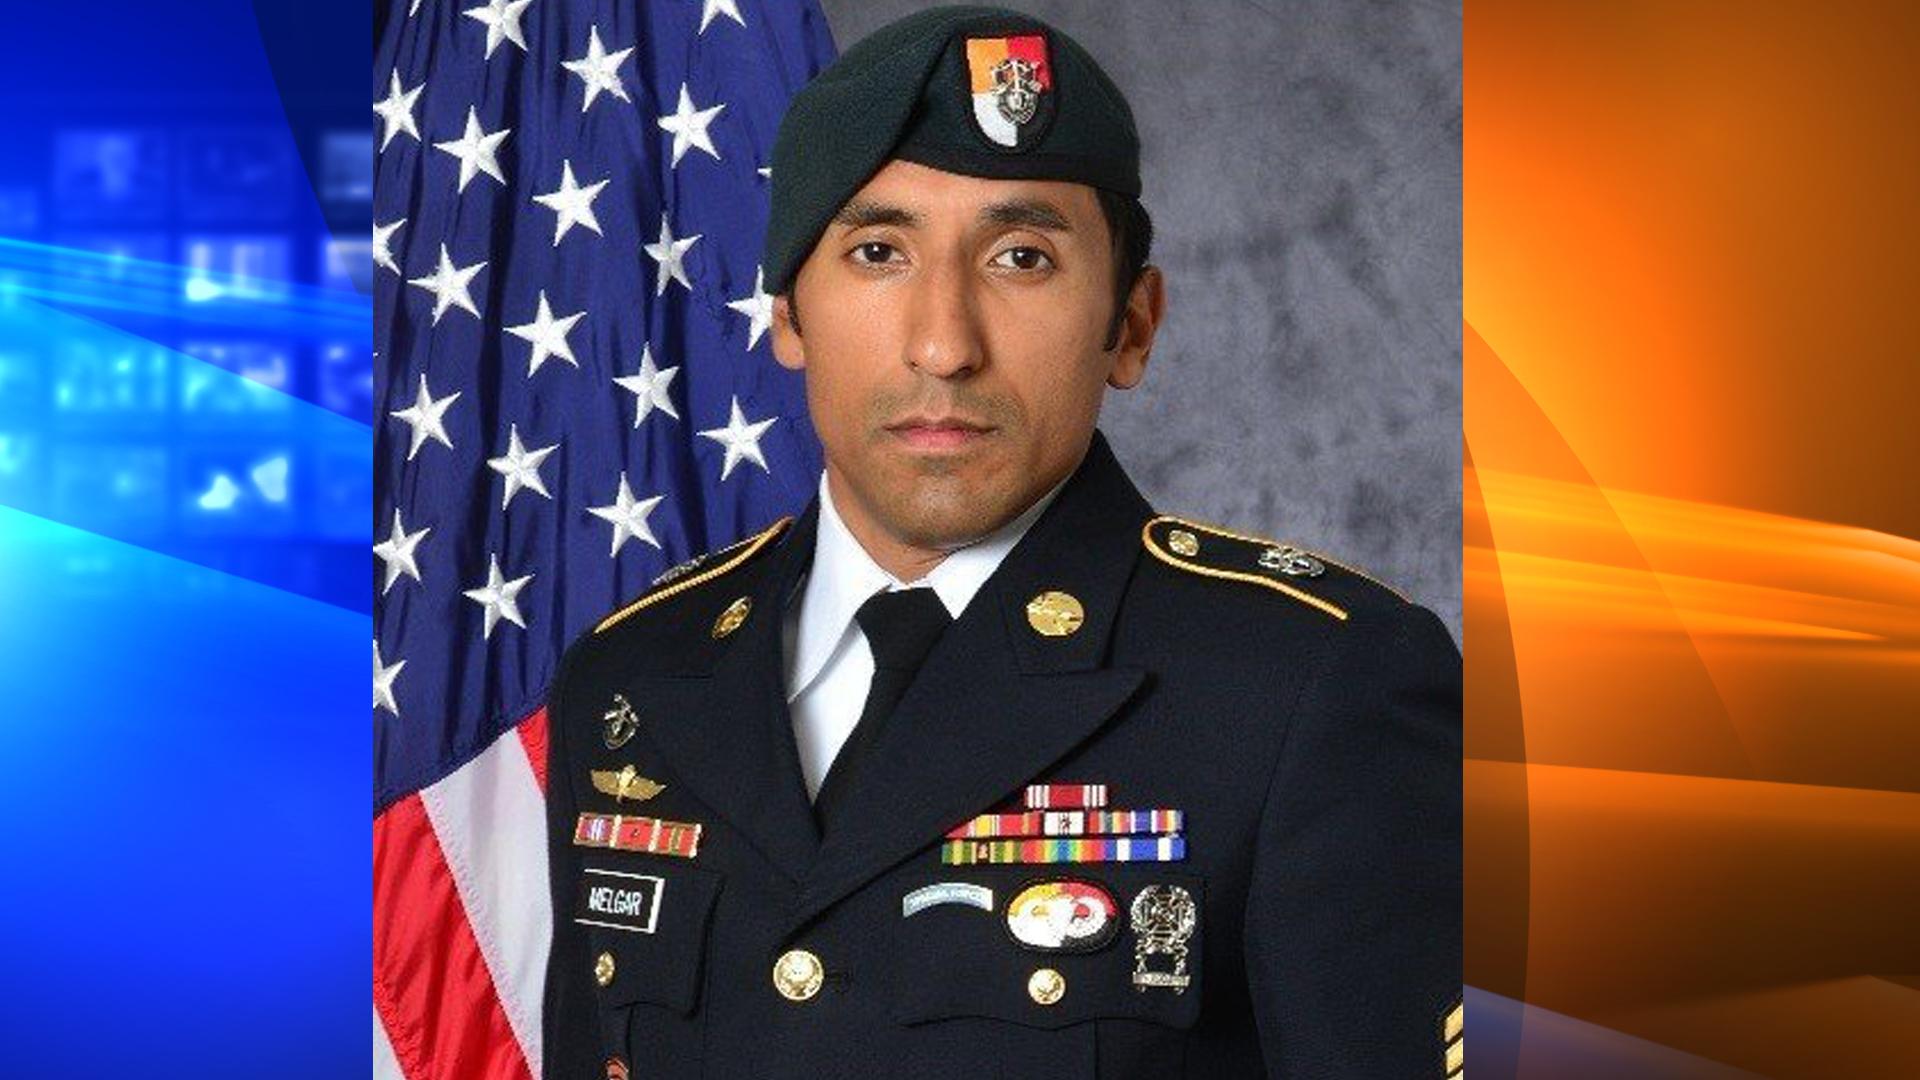 Staff Sgt. Logan Melgar, a Green Beret, was killed in June in Mali. (Credit: U.S. Army)